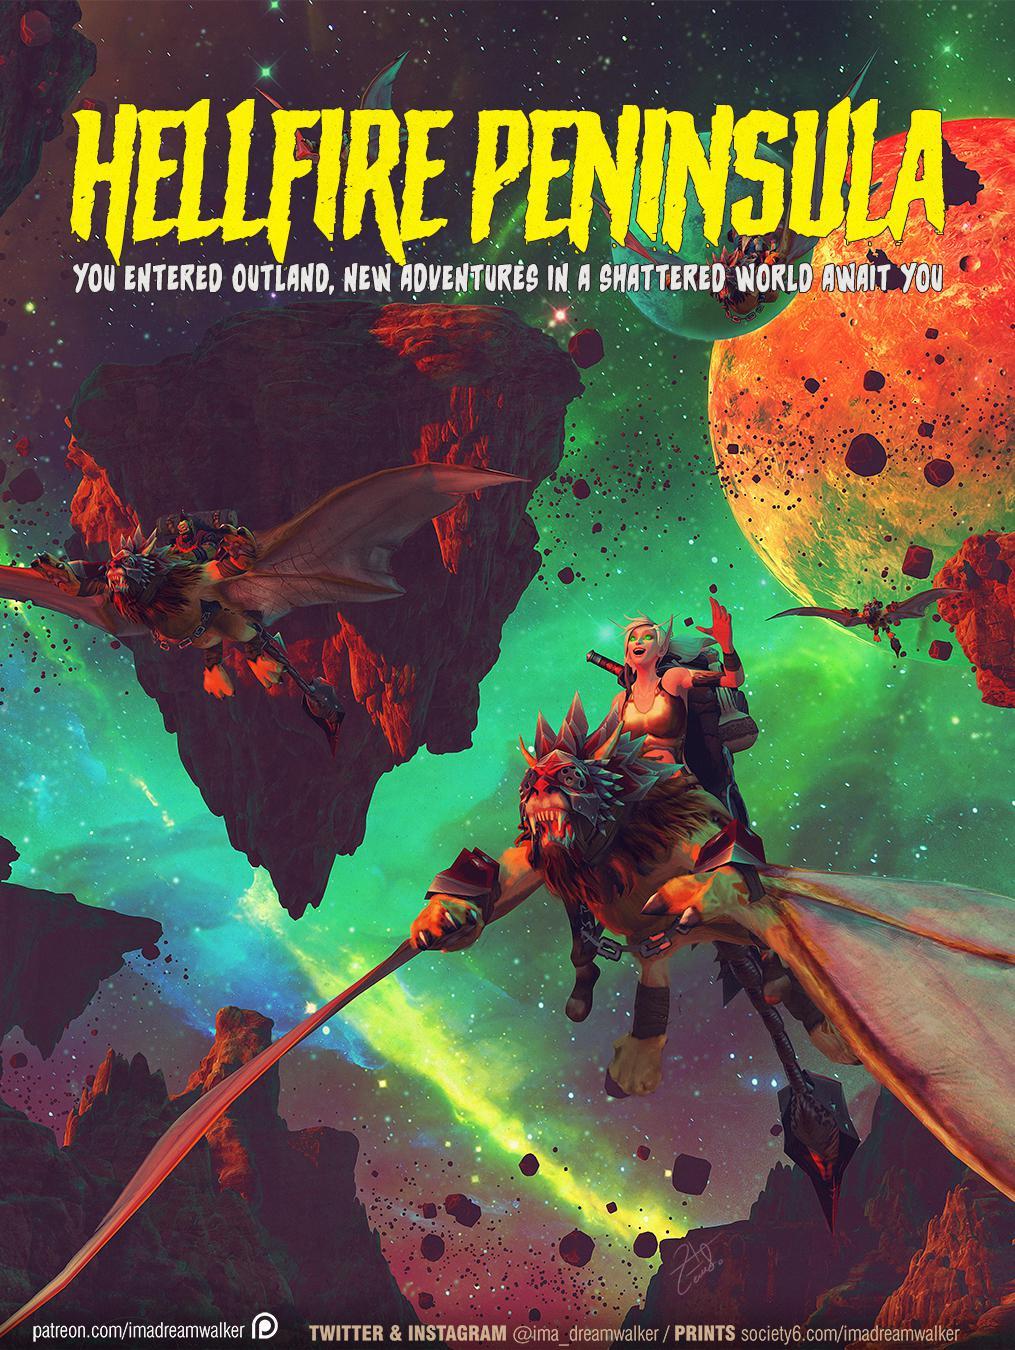 Wow Hellfire Peninsula : hellfire, peninsula, Hellfire, Peninsula, Dreamwalker], Mysterious, Adventures, Await, Shattered, World!, Alliance, Version, Coming, Soon.